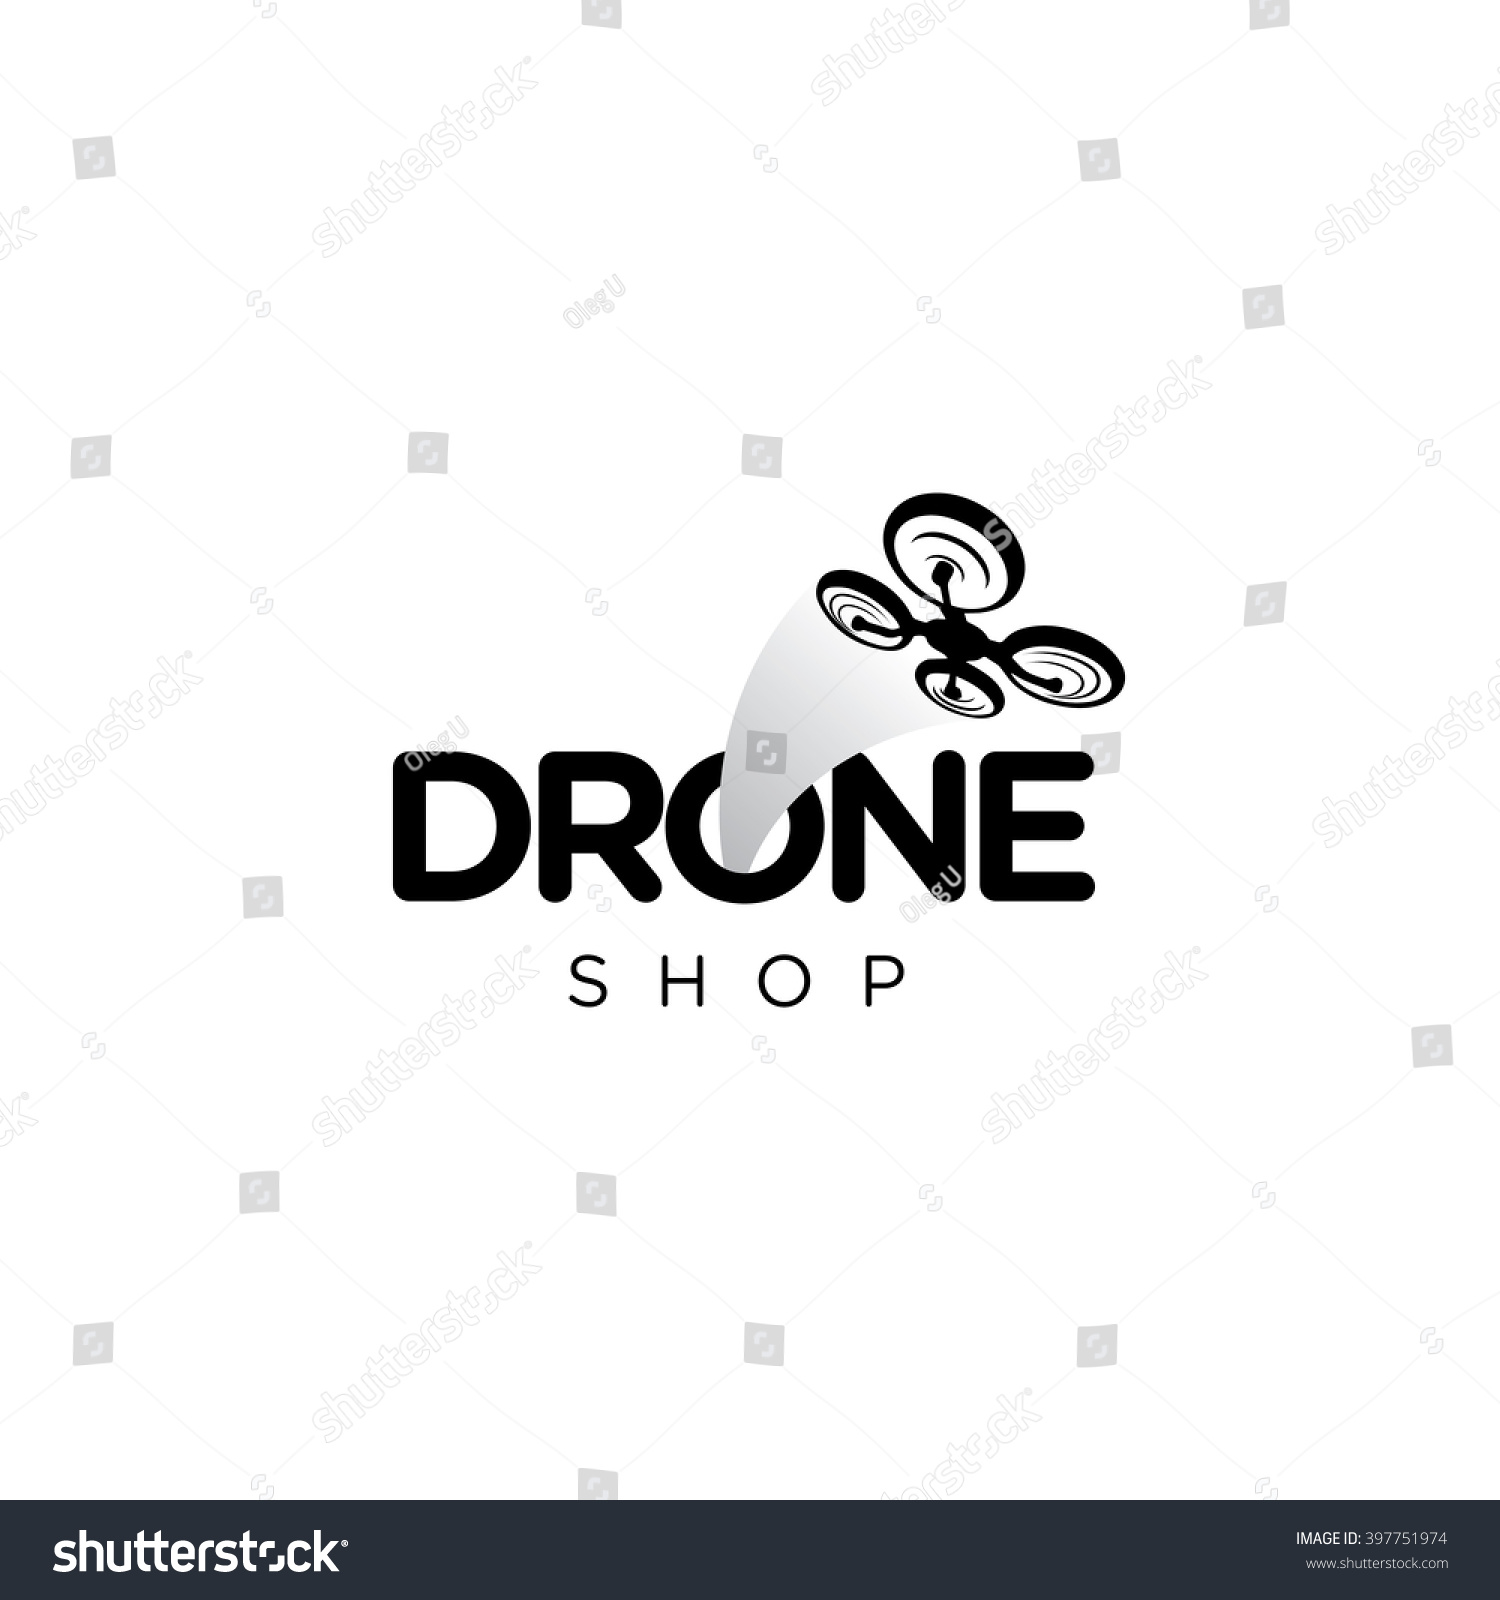 drone quadcopter vector template logo stock vector. Black Bedroom Furniture Sets. Home Design Ideas